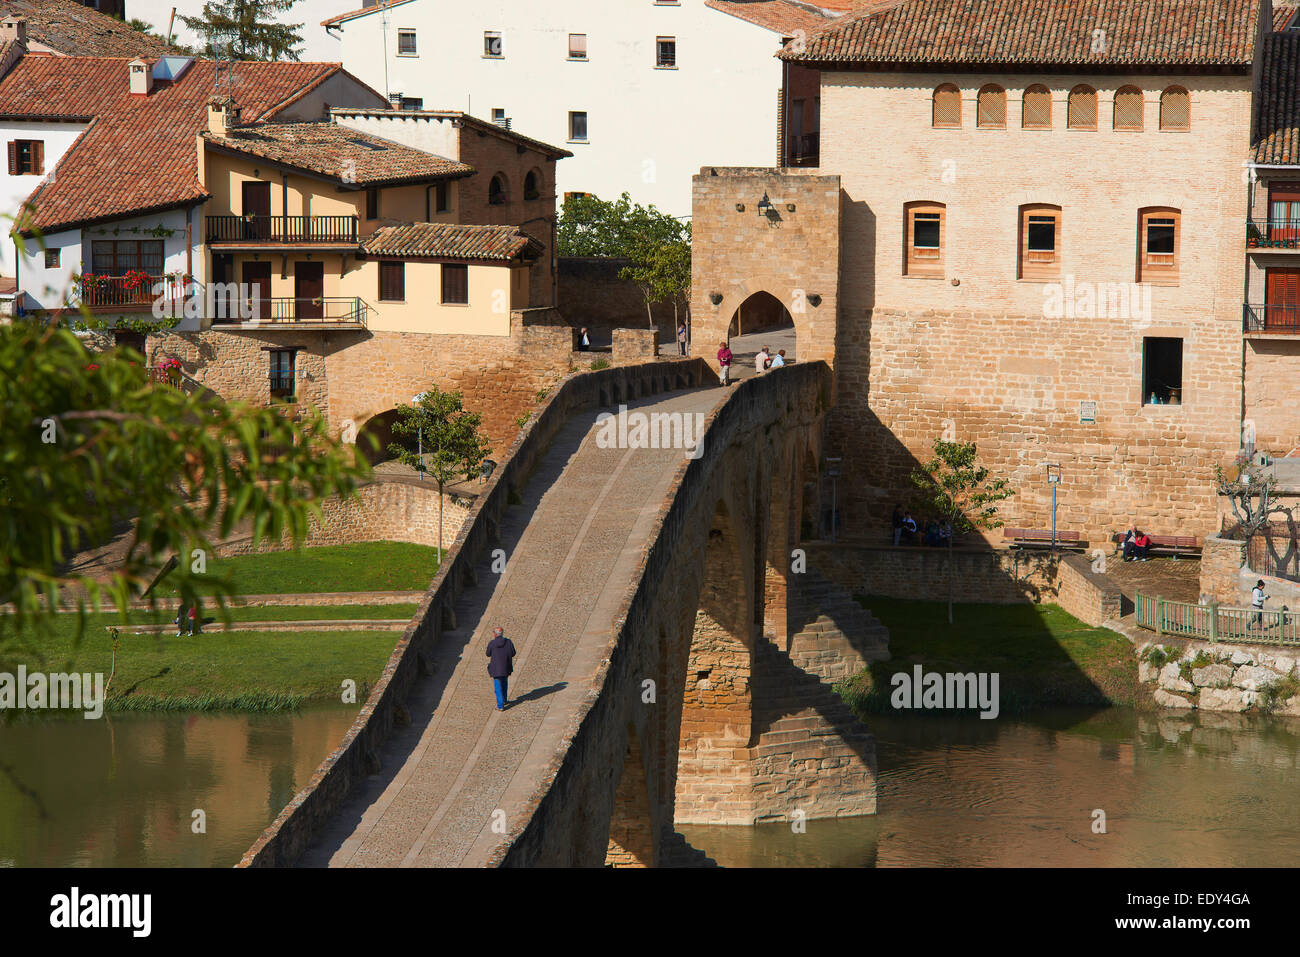 Road to Santiago, Puente la Reina, Gares, Medieval bridge, Arga River, Way of St James, Navarre, Spain, Europe. - Stock Image